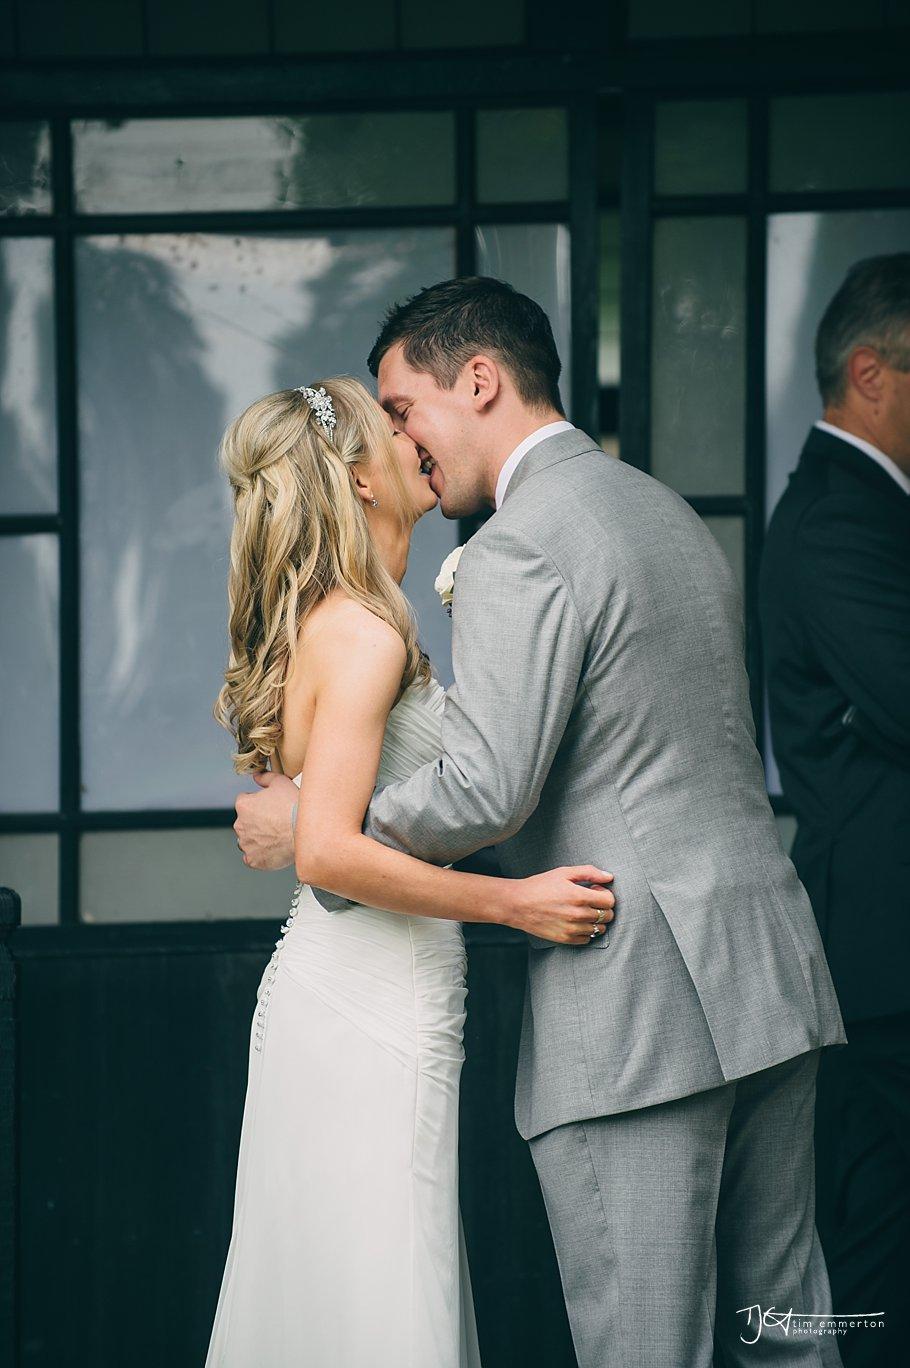 Wedding-Photographer-Fanhams-Hall-Hotel-Hertfordshire-064.jpg